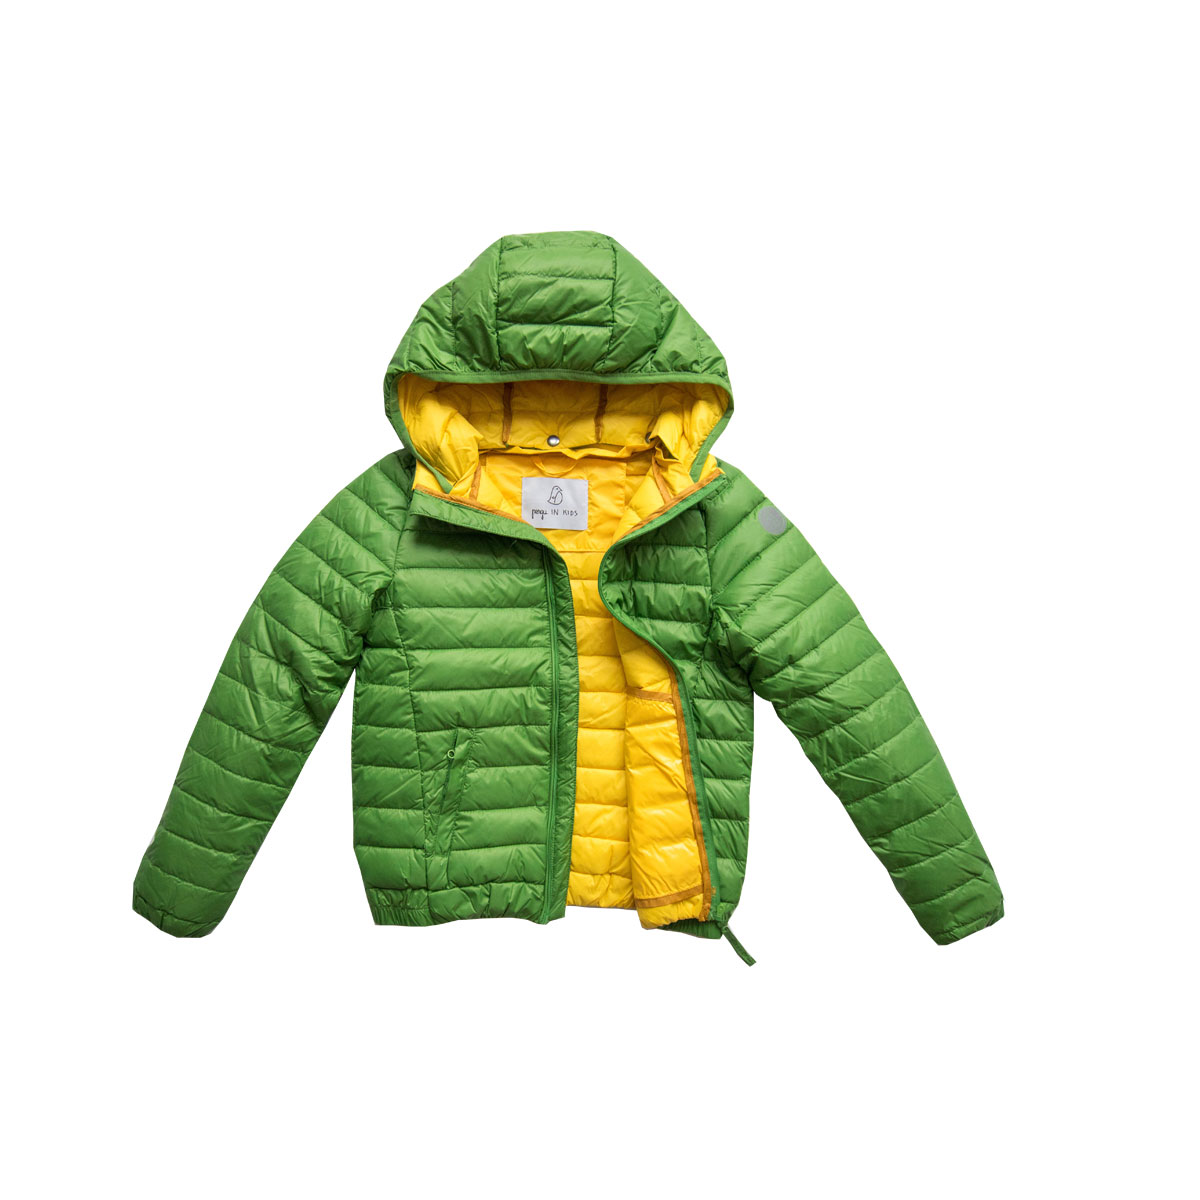 Pengu KIDS green ultra light down jacket